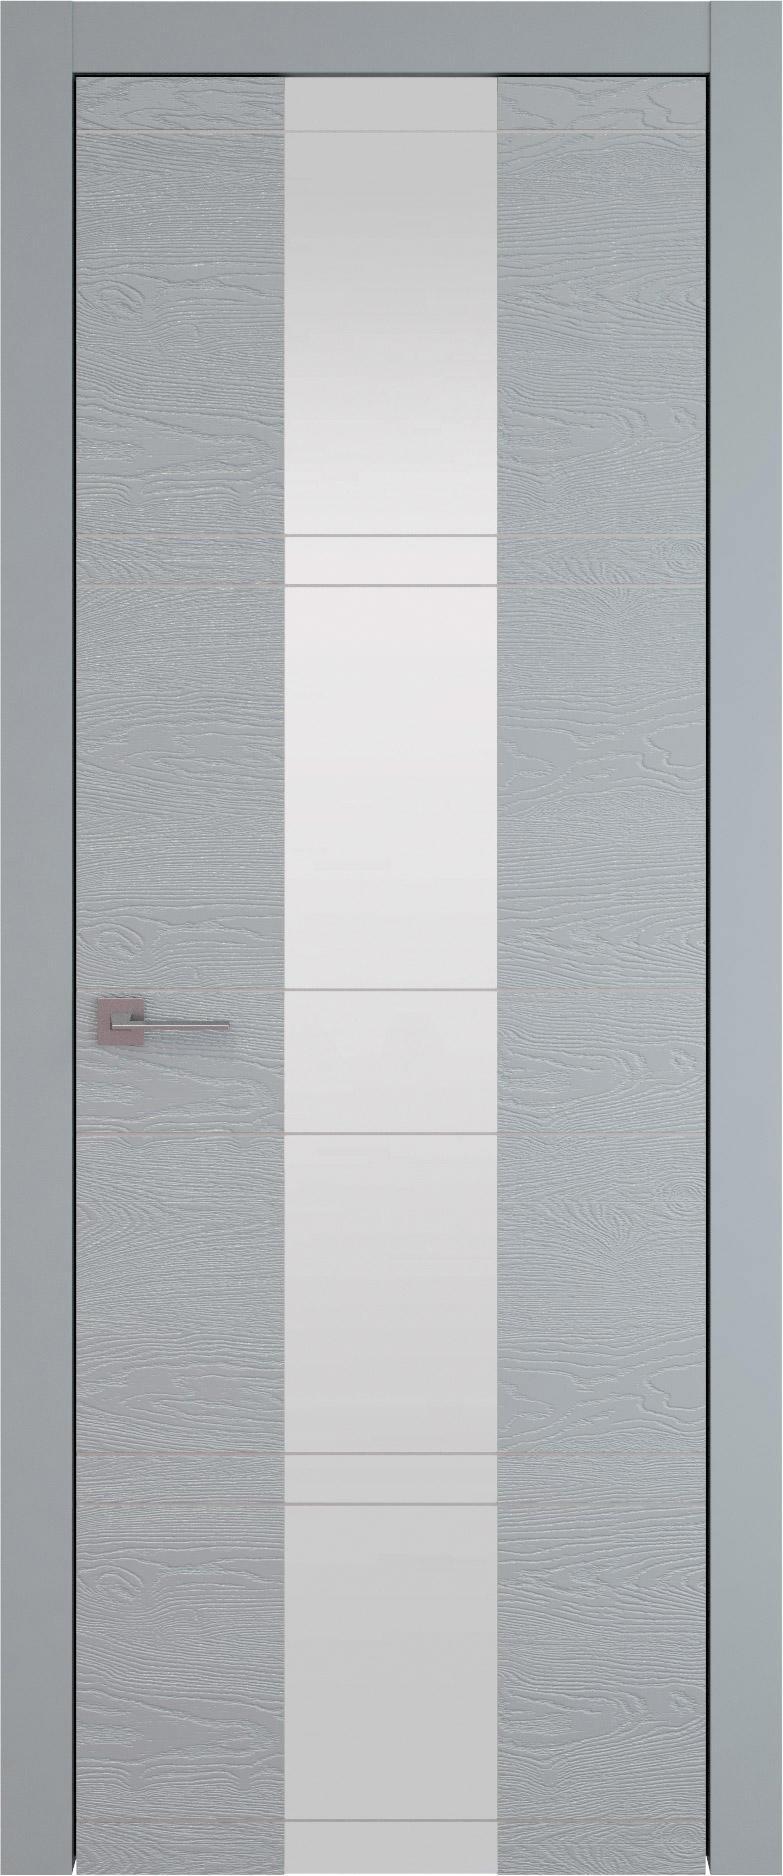 Tivoli Ж-2 цвет - Серебристо-серая эмаль по шпону (RAL 7045) Со стеклом (ДО)